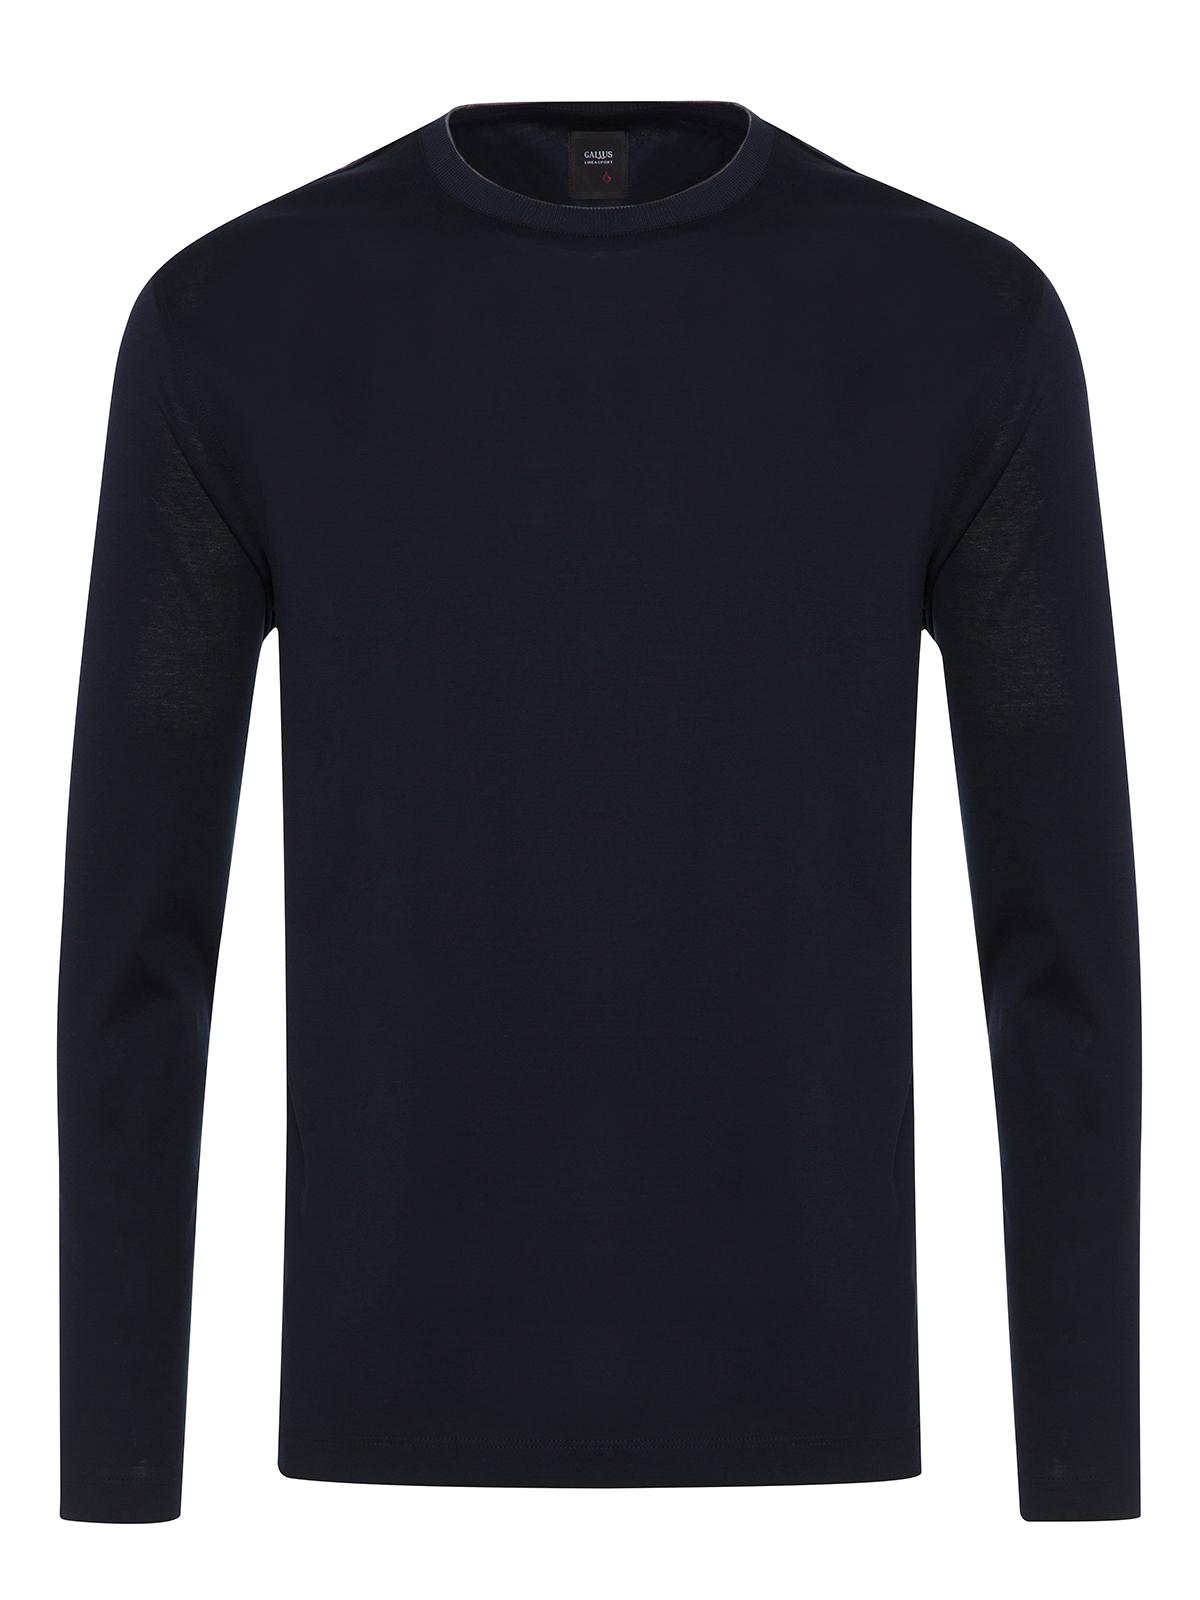 Gallus - Gallus Lacivert Filo Di Scozia Örme Bisiklet Yaka Tailor Fit Uzun Kollu T-Shirt